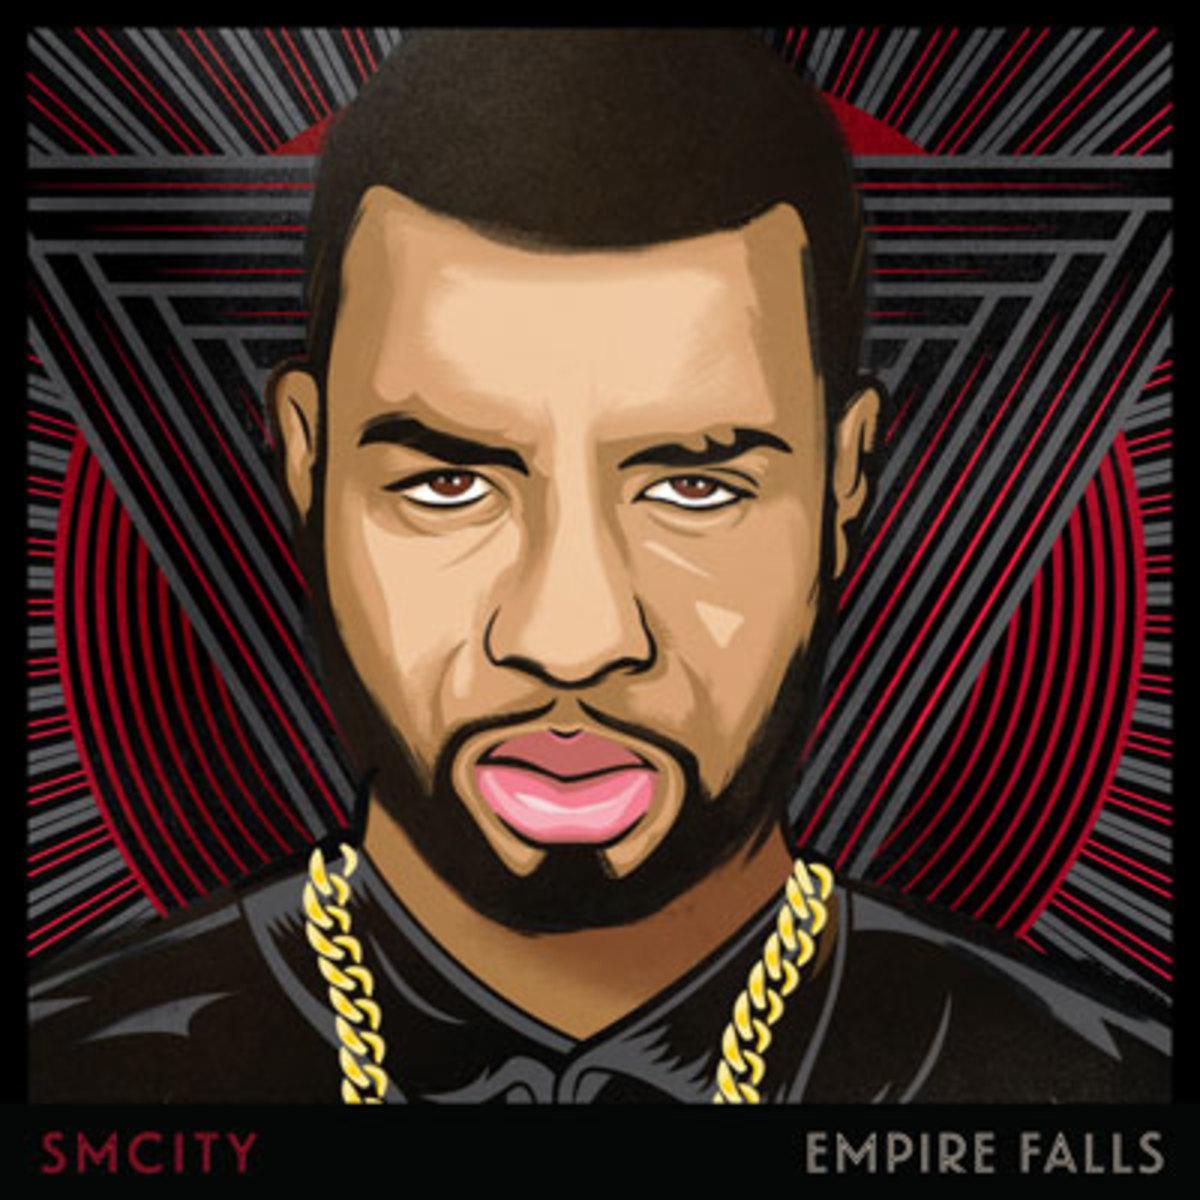 smcity-empirefalls.jpg